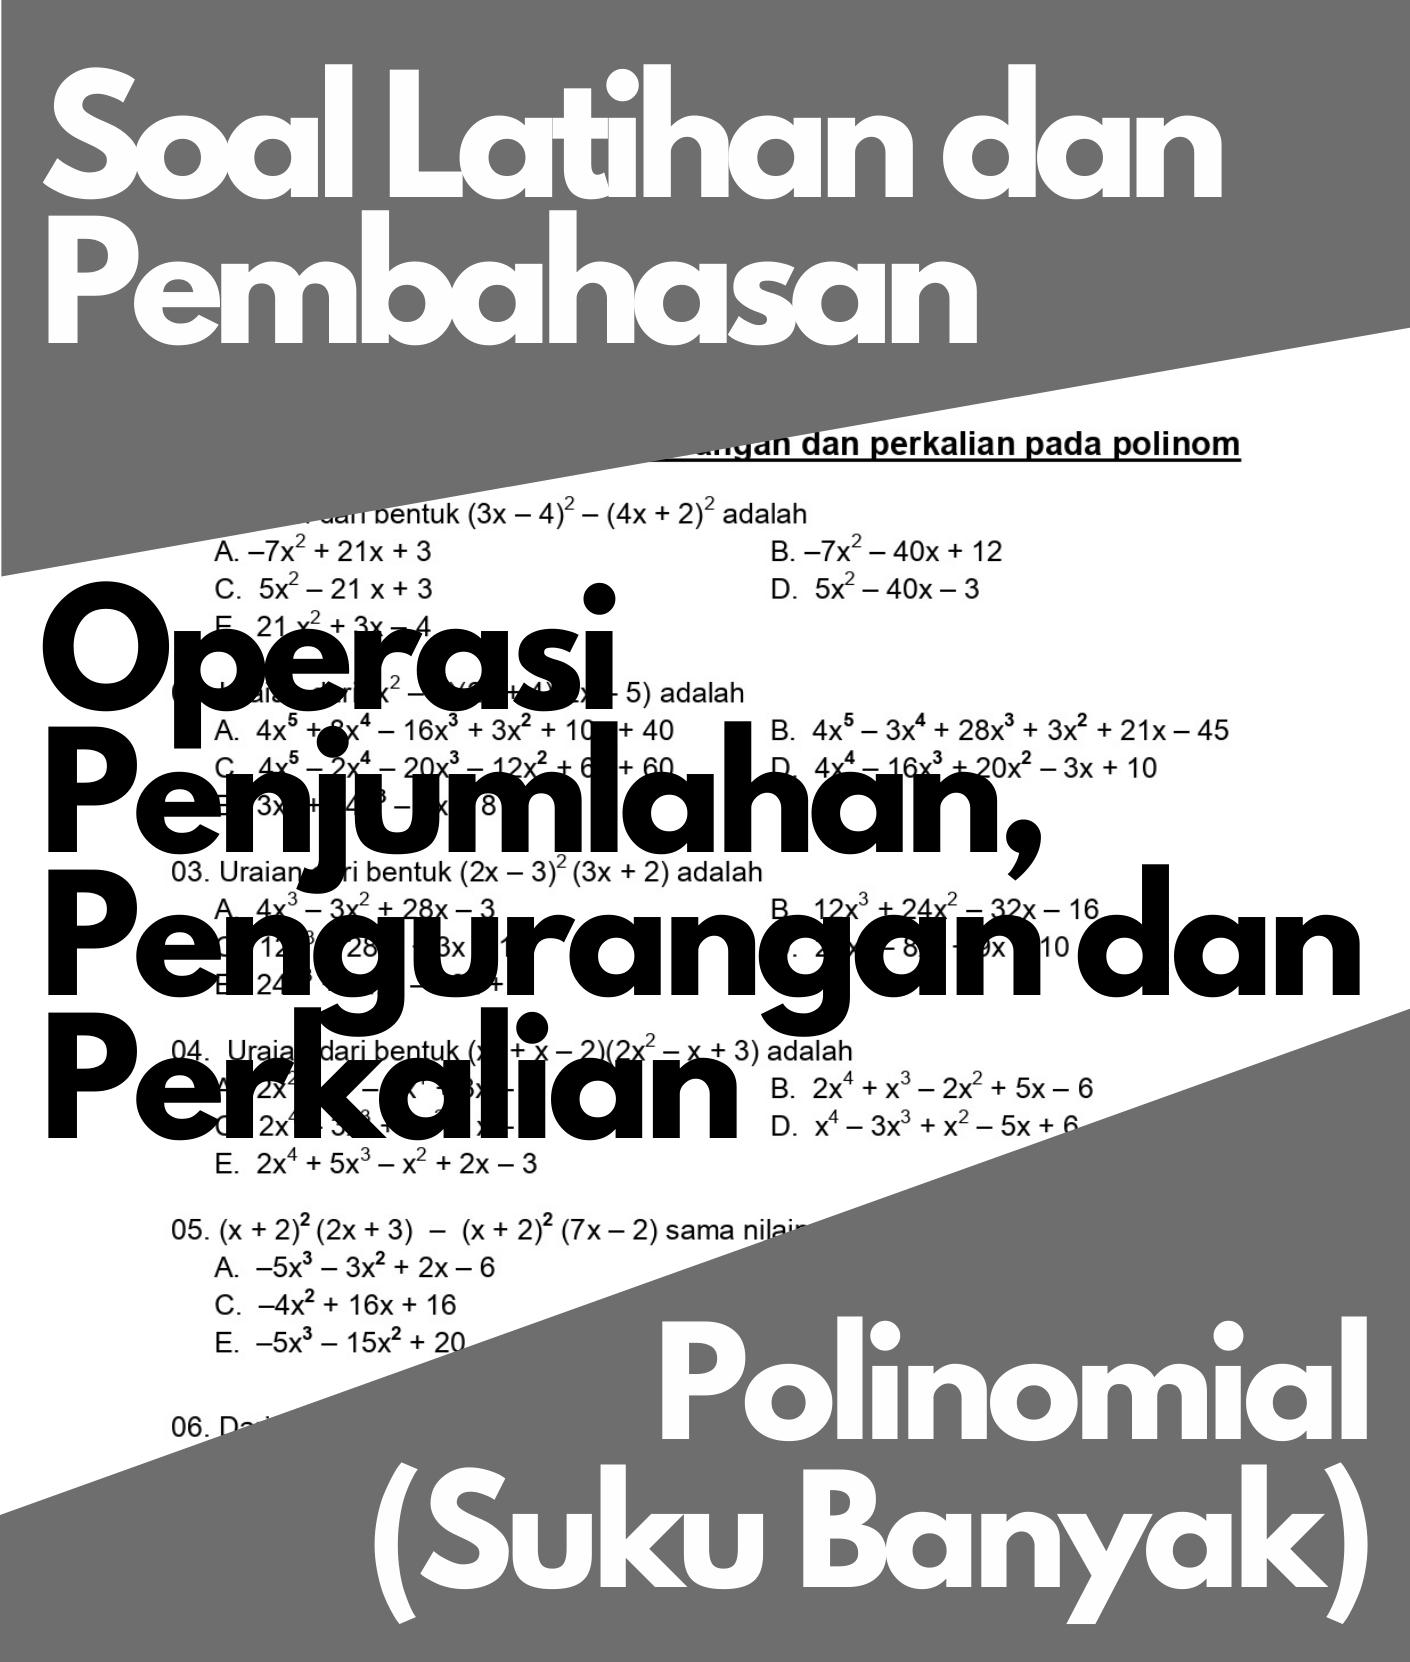 Matematika Dasar SMA: Soal Latihan dan Pembahasan Operasi Penjumlahan, Pengurangan dan Perkalian Suku Banyak (Polinomial)